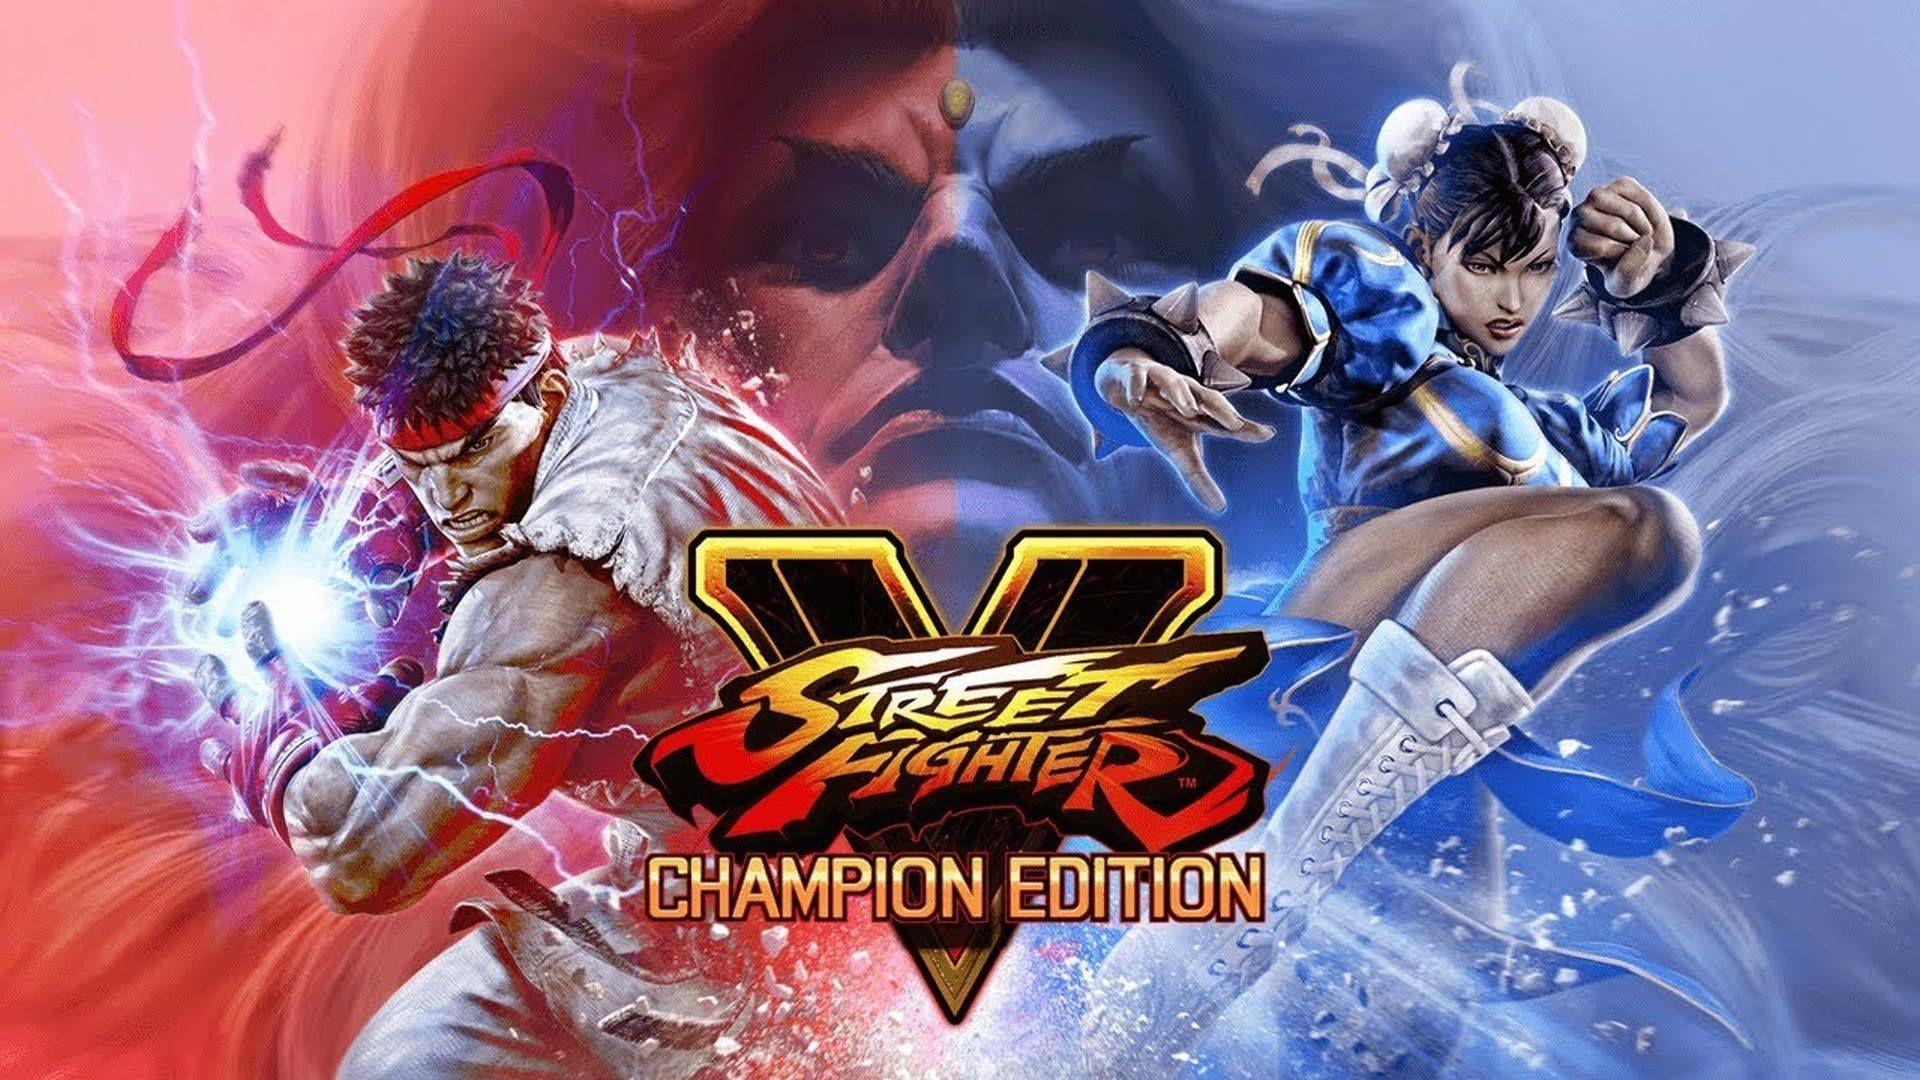 Street Fighter V: Champion Edition çıktı